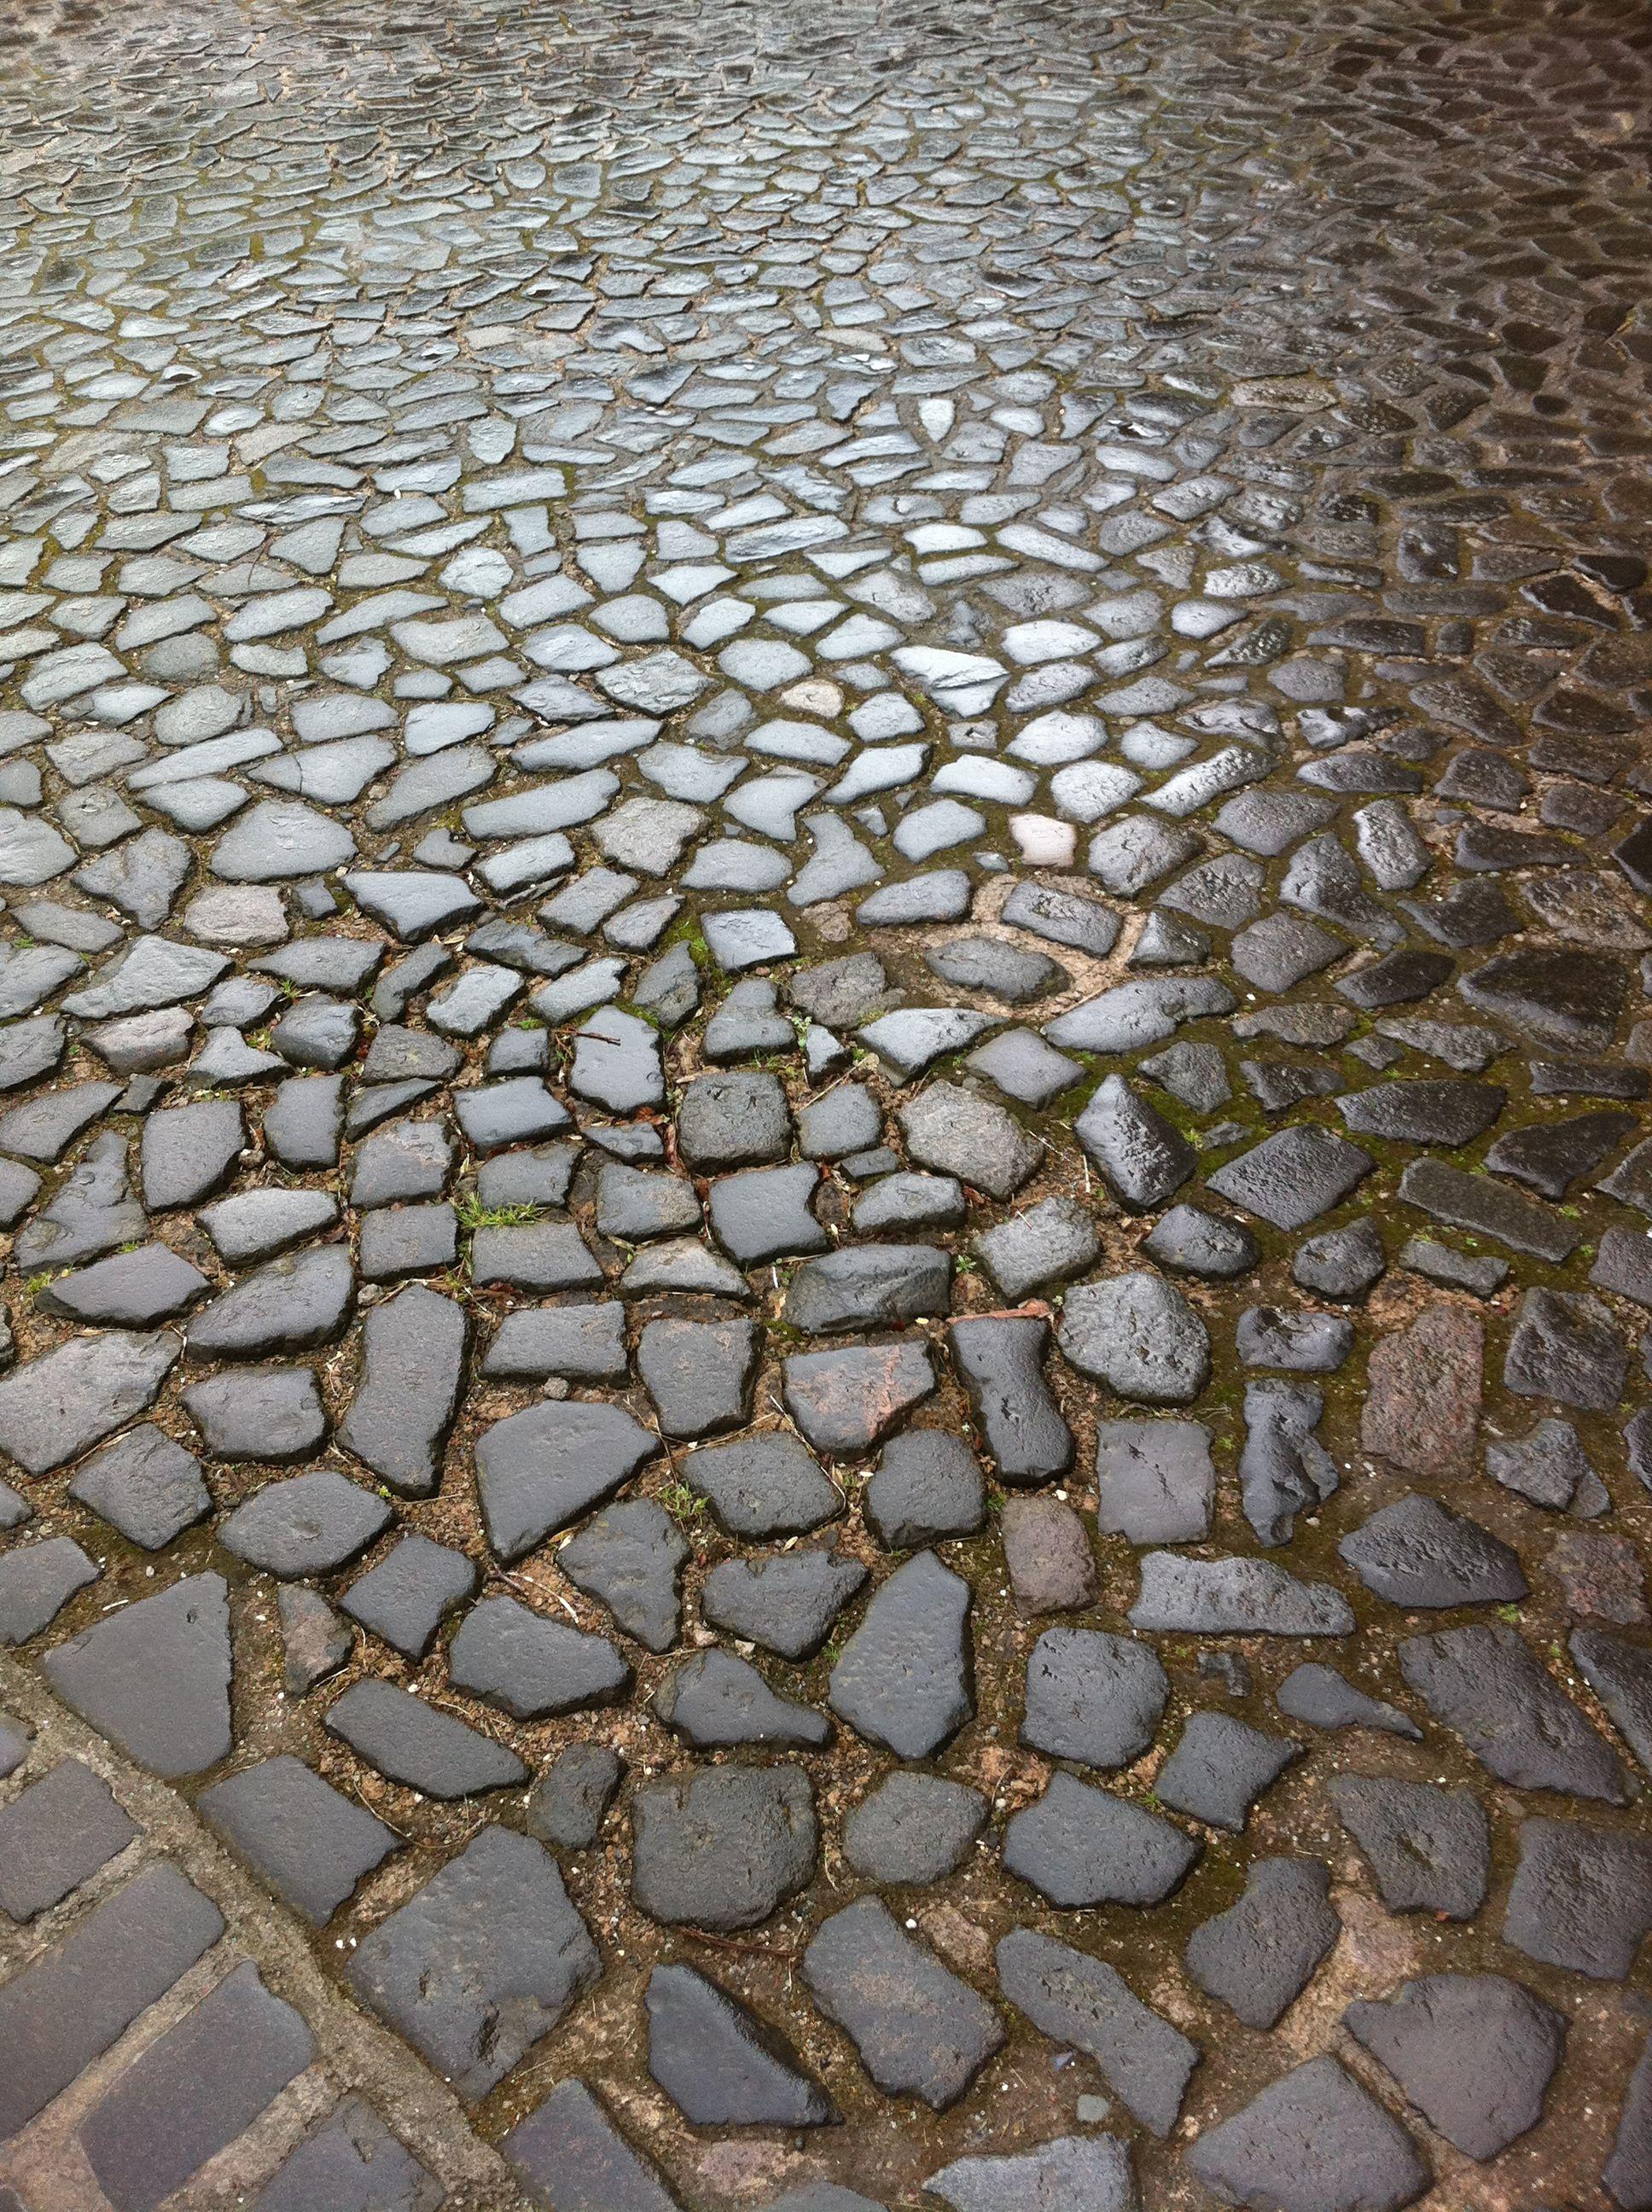 Cobble stone at Stirling Castle. I love cobble stone!